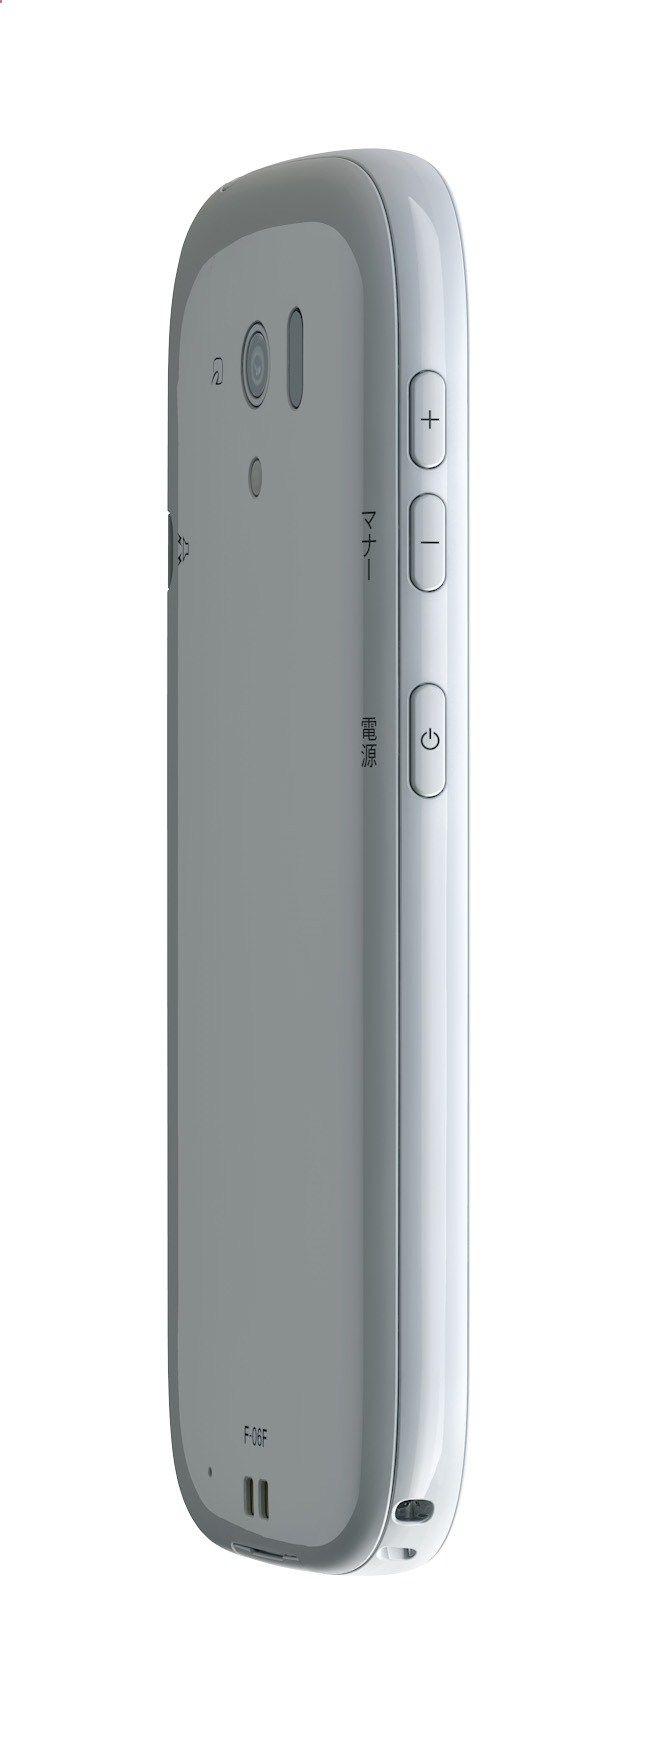 Fujitsu phones and products tech specs on techspecification F-06F 곡선이이쁘고smeg을떠올리게함